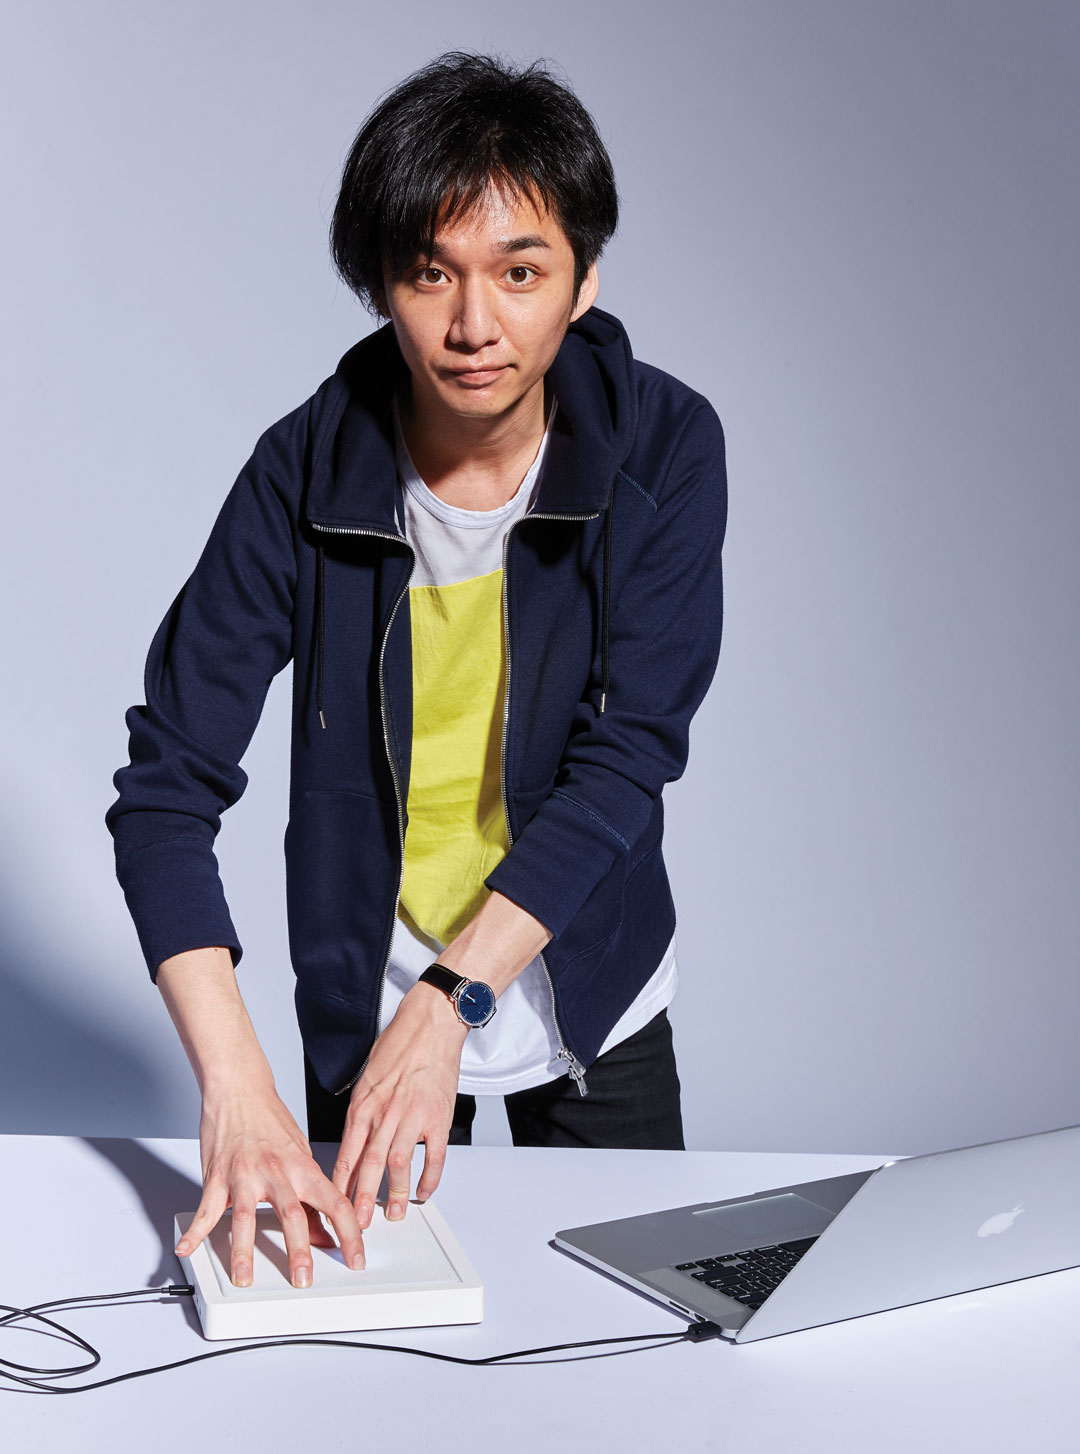 Yoshihito Nakanishi